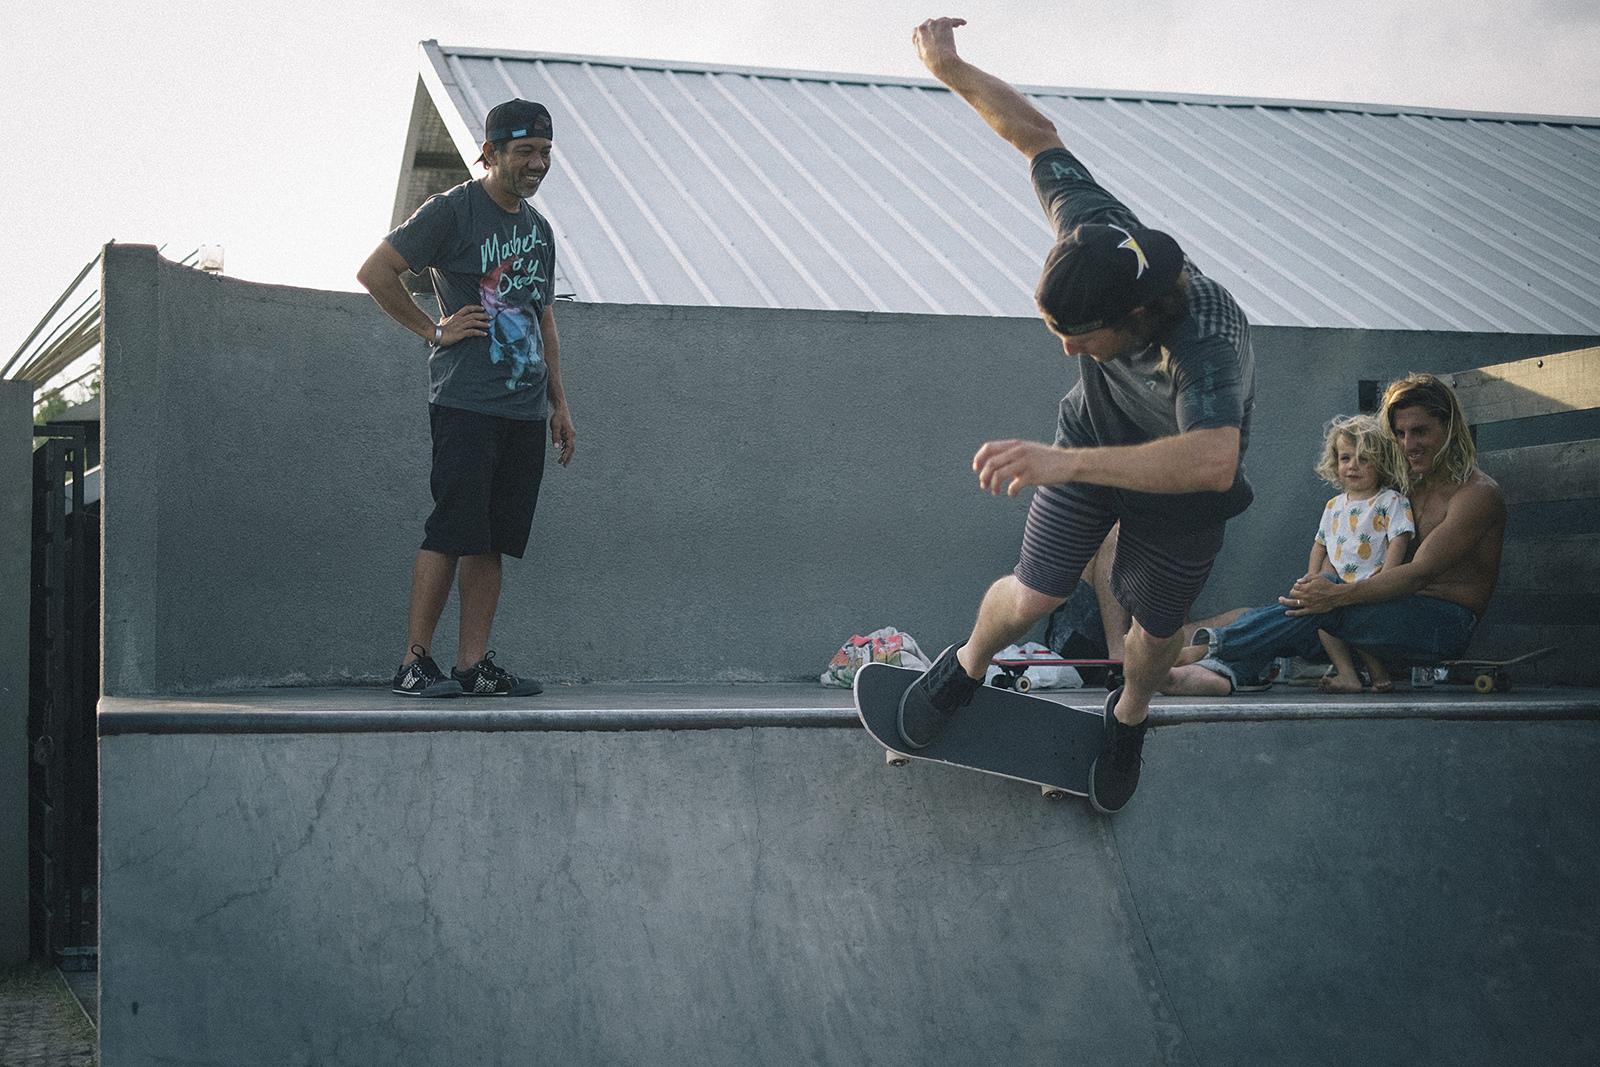 Cam McCaul and Chandra Ariavijaya skate Bali Indonesia